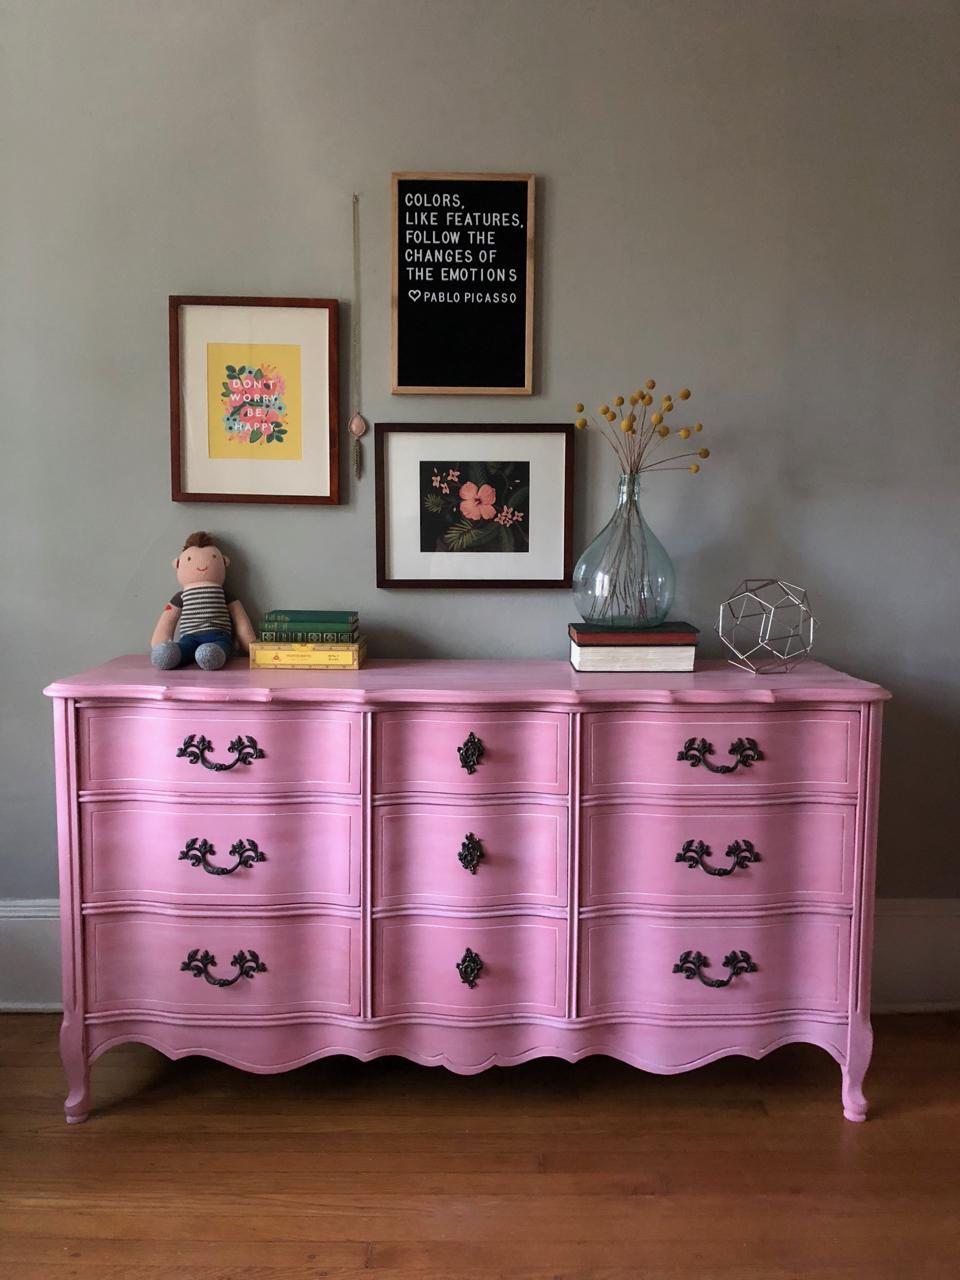 jo-torrijos-a-simpler-design-atlanta-painted-furniture-annie-sloan-pink-dresser-french-provincial-14.jpg